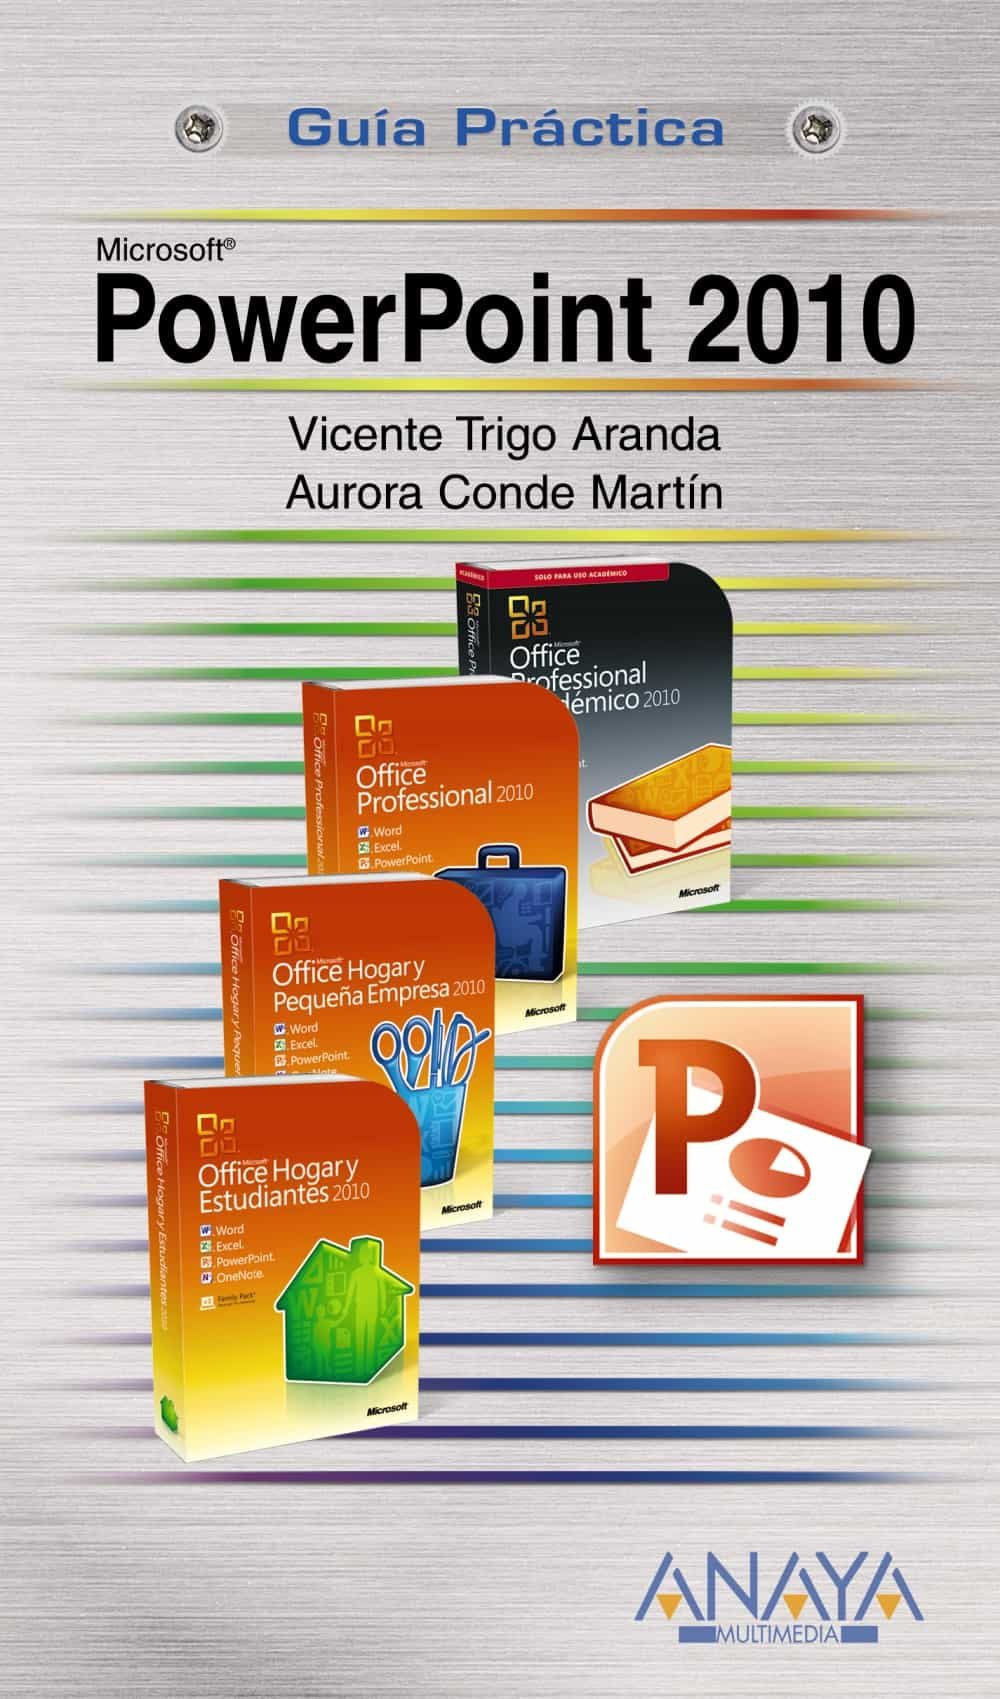 powerpoint 2010 guas prcticas